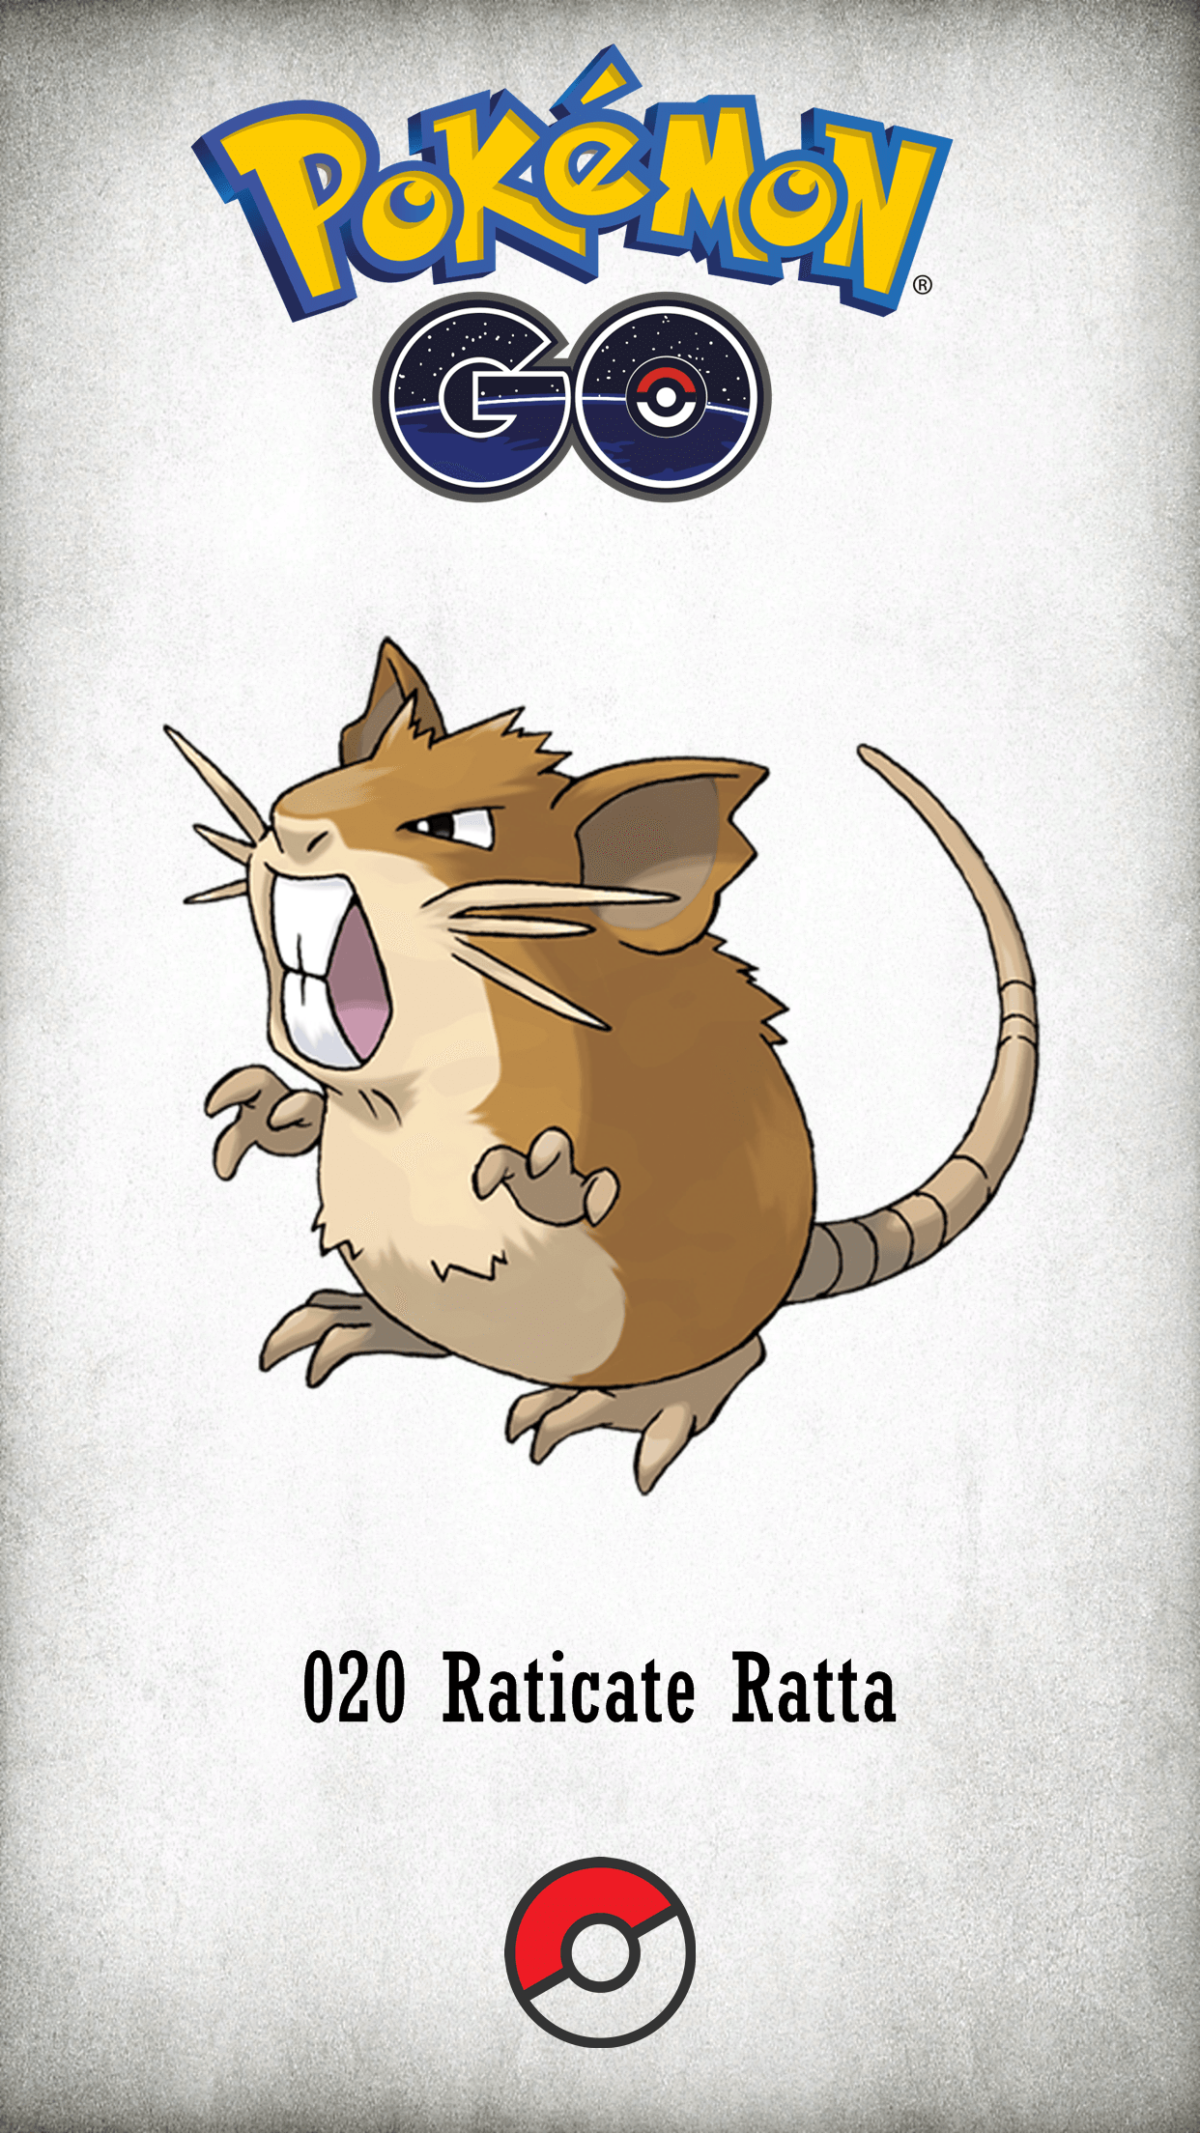 020 Character Raticate Ratta | Wallpaper